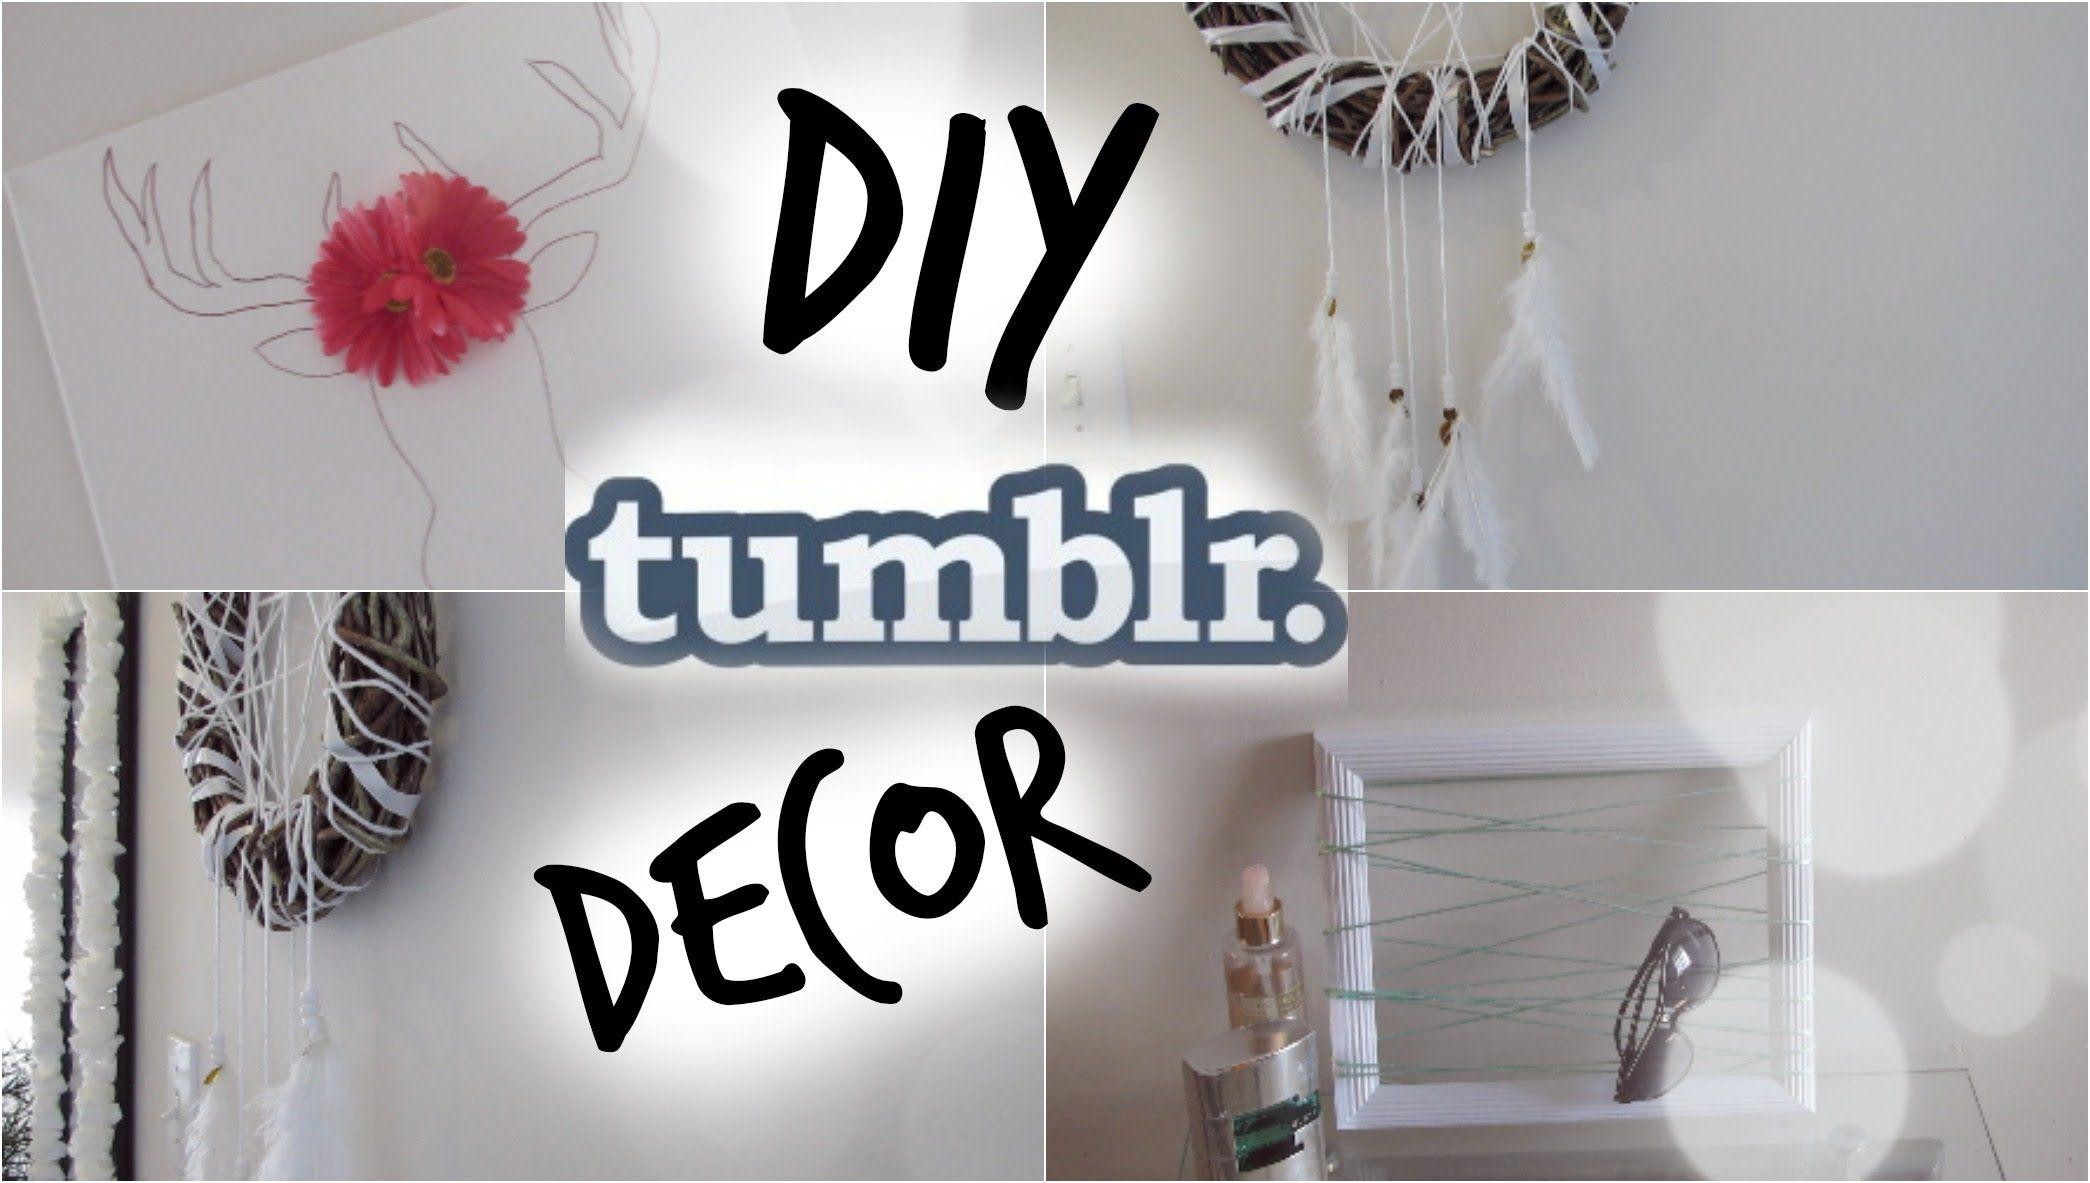 diy tumblr room decor cheap easy pinterest inspired diy